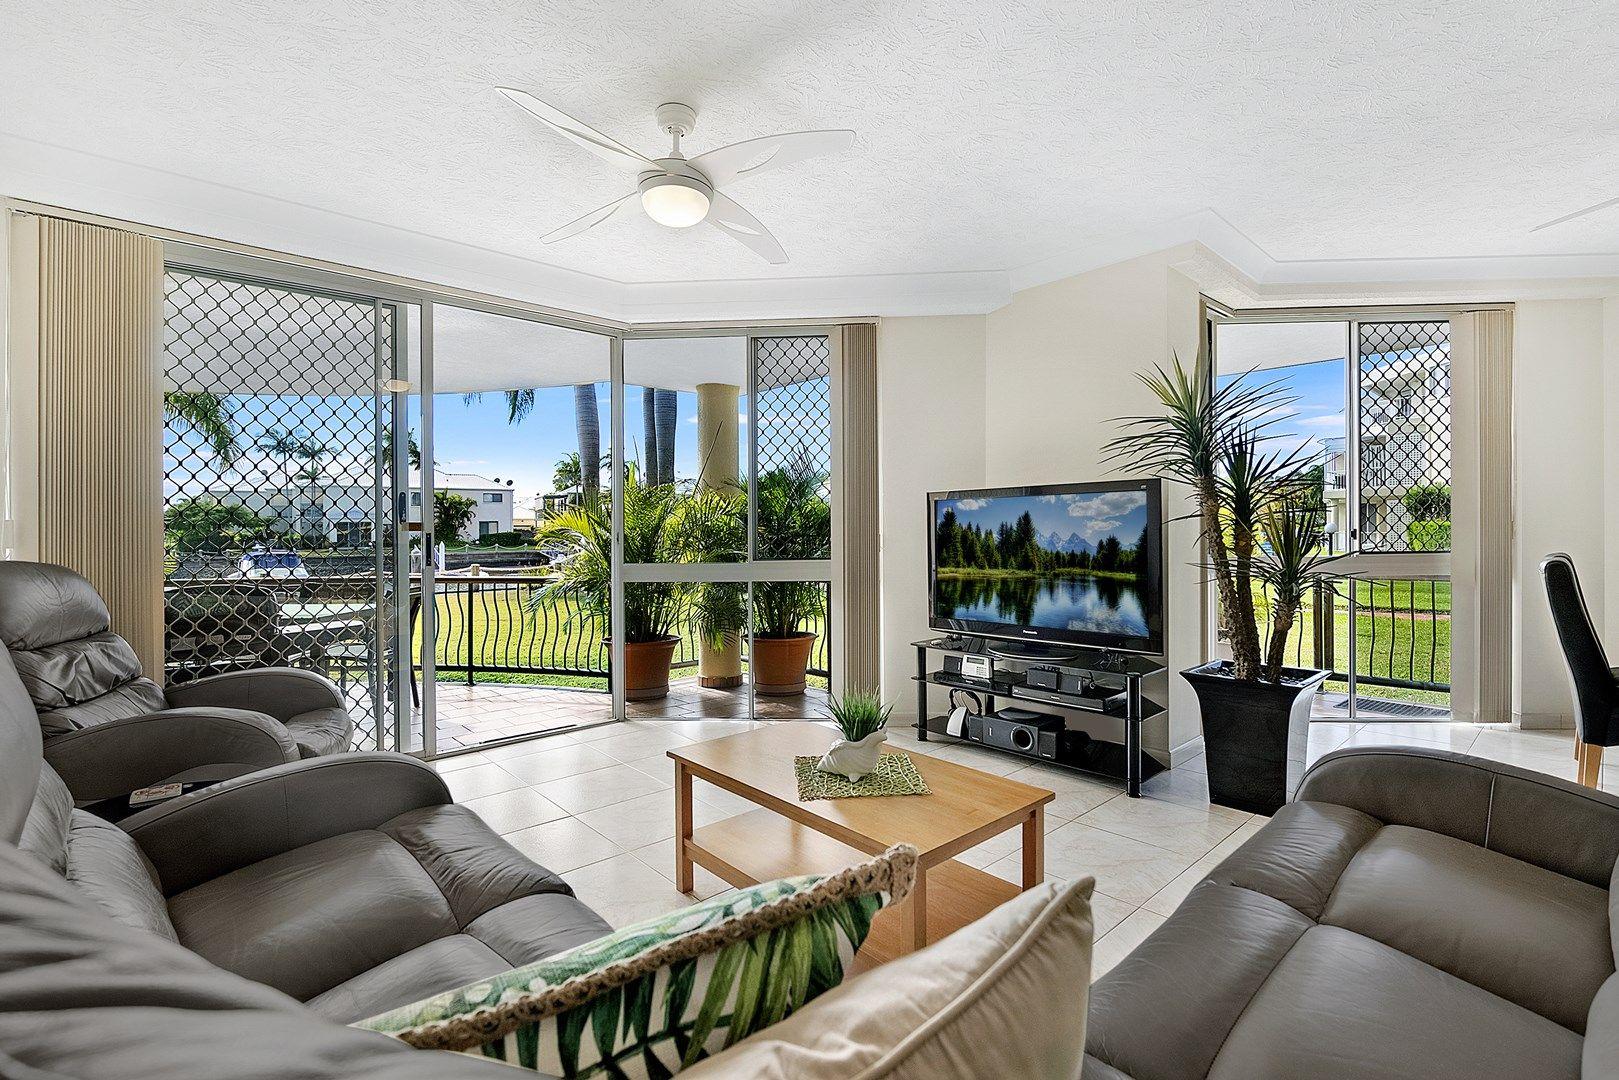 14/41A Broadwater Street, Runaway Bay QLD 4216, Image 2